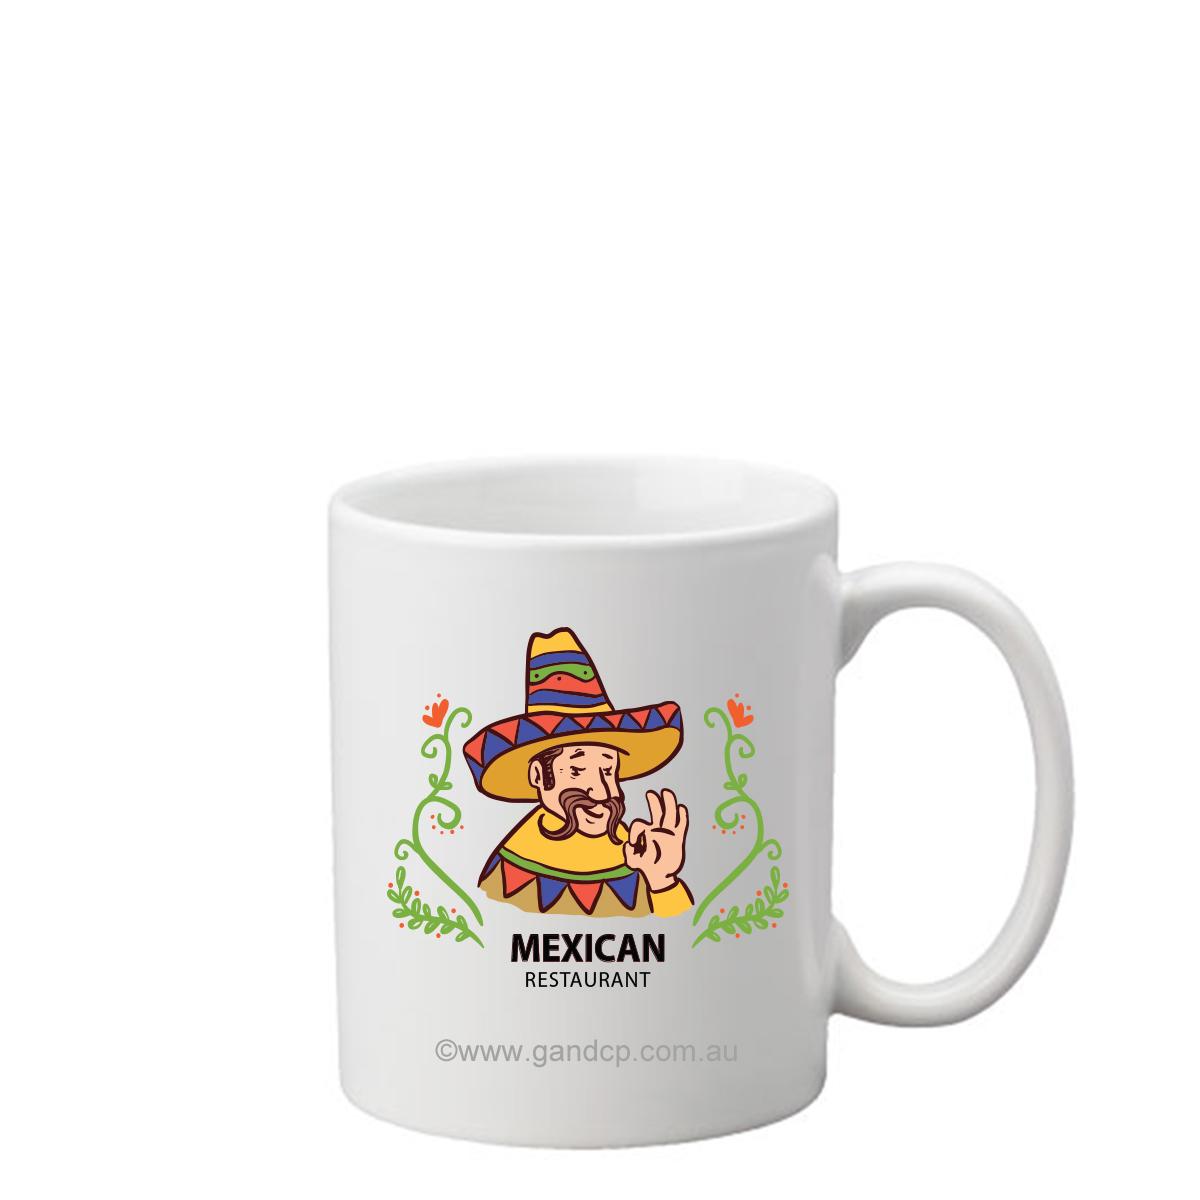 Ceramic Mug Printing